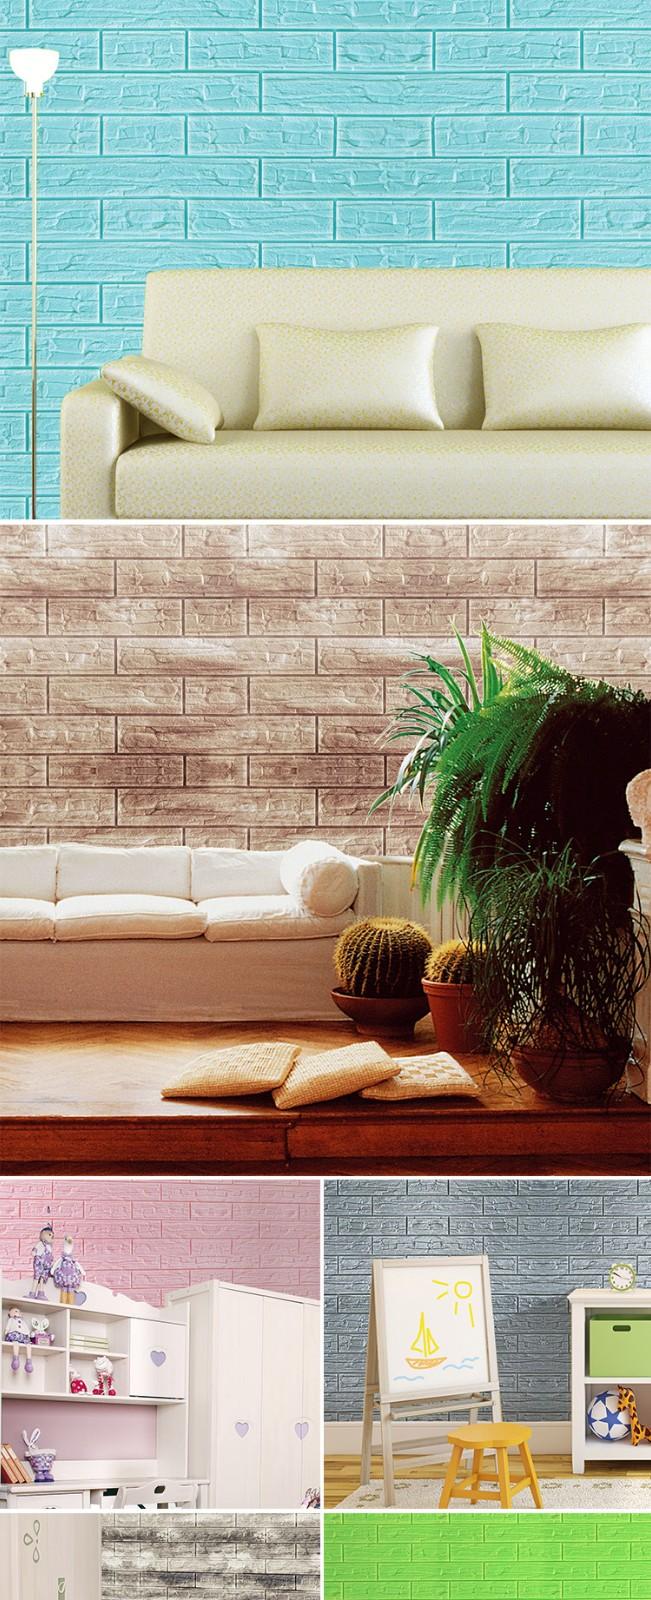 SUNYE XPE foam film directly sale for living room-4